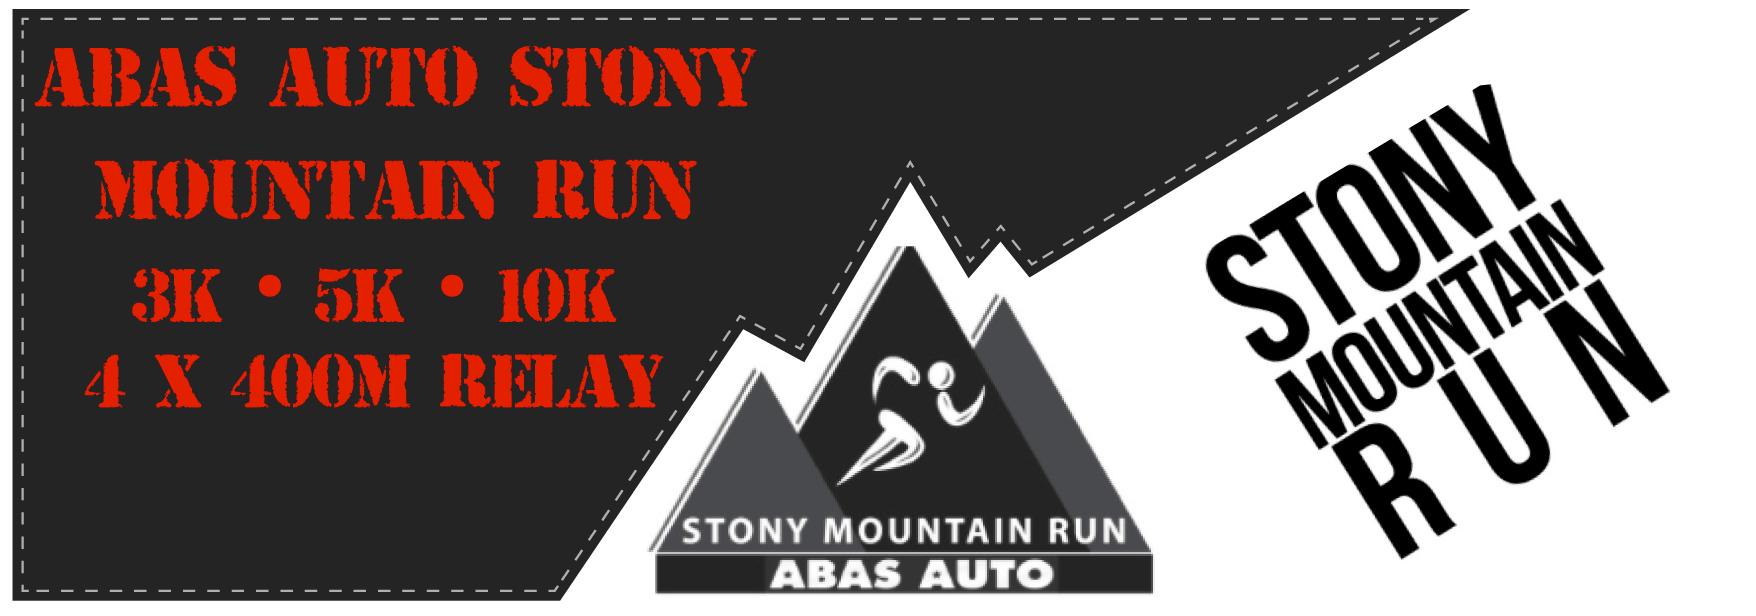 Abas Auto Stony Mountain Run